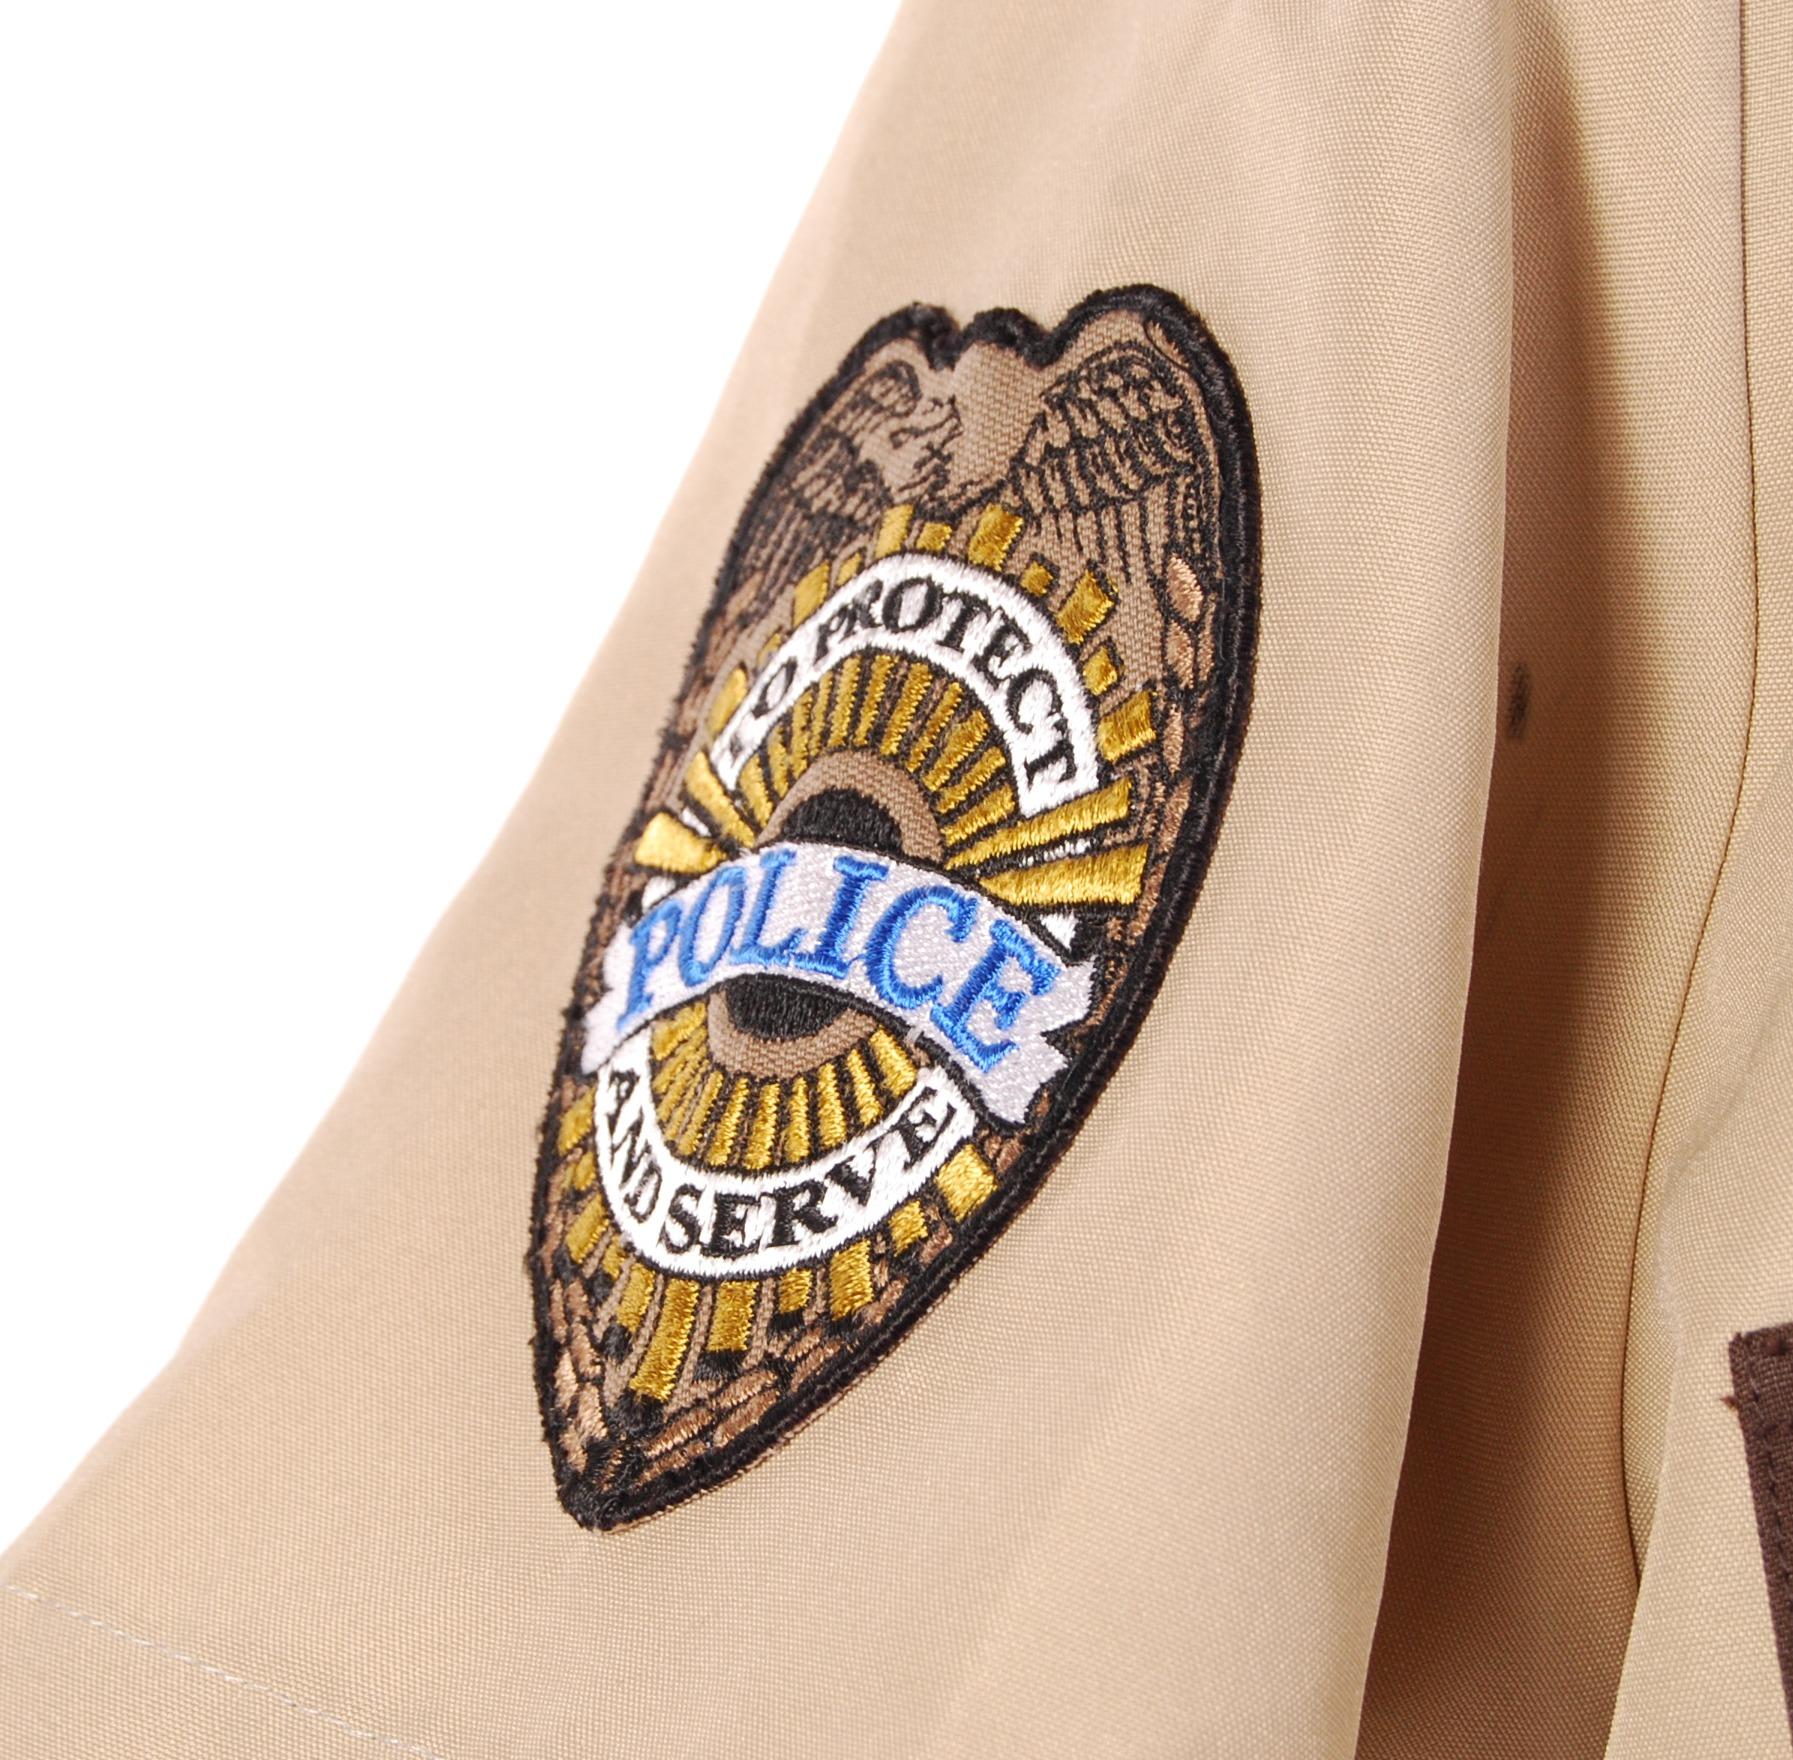 Lot 50 - PIRANHA 3DD - ORIGINAL SCREEN WORN SHERIFF COSTUME